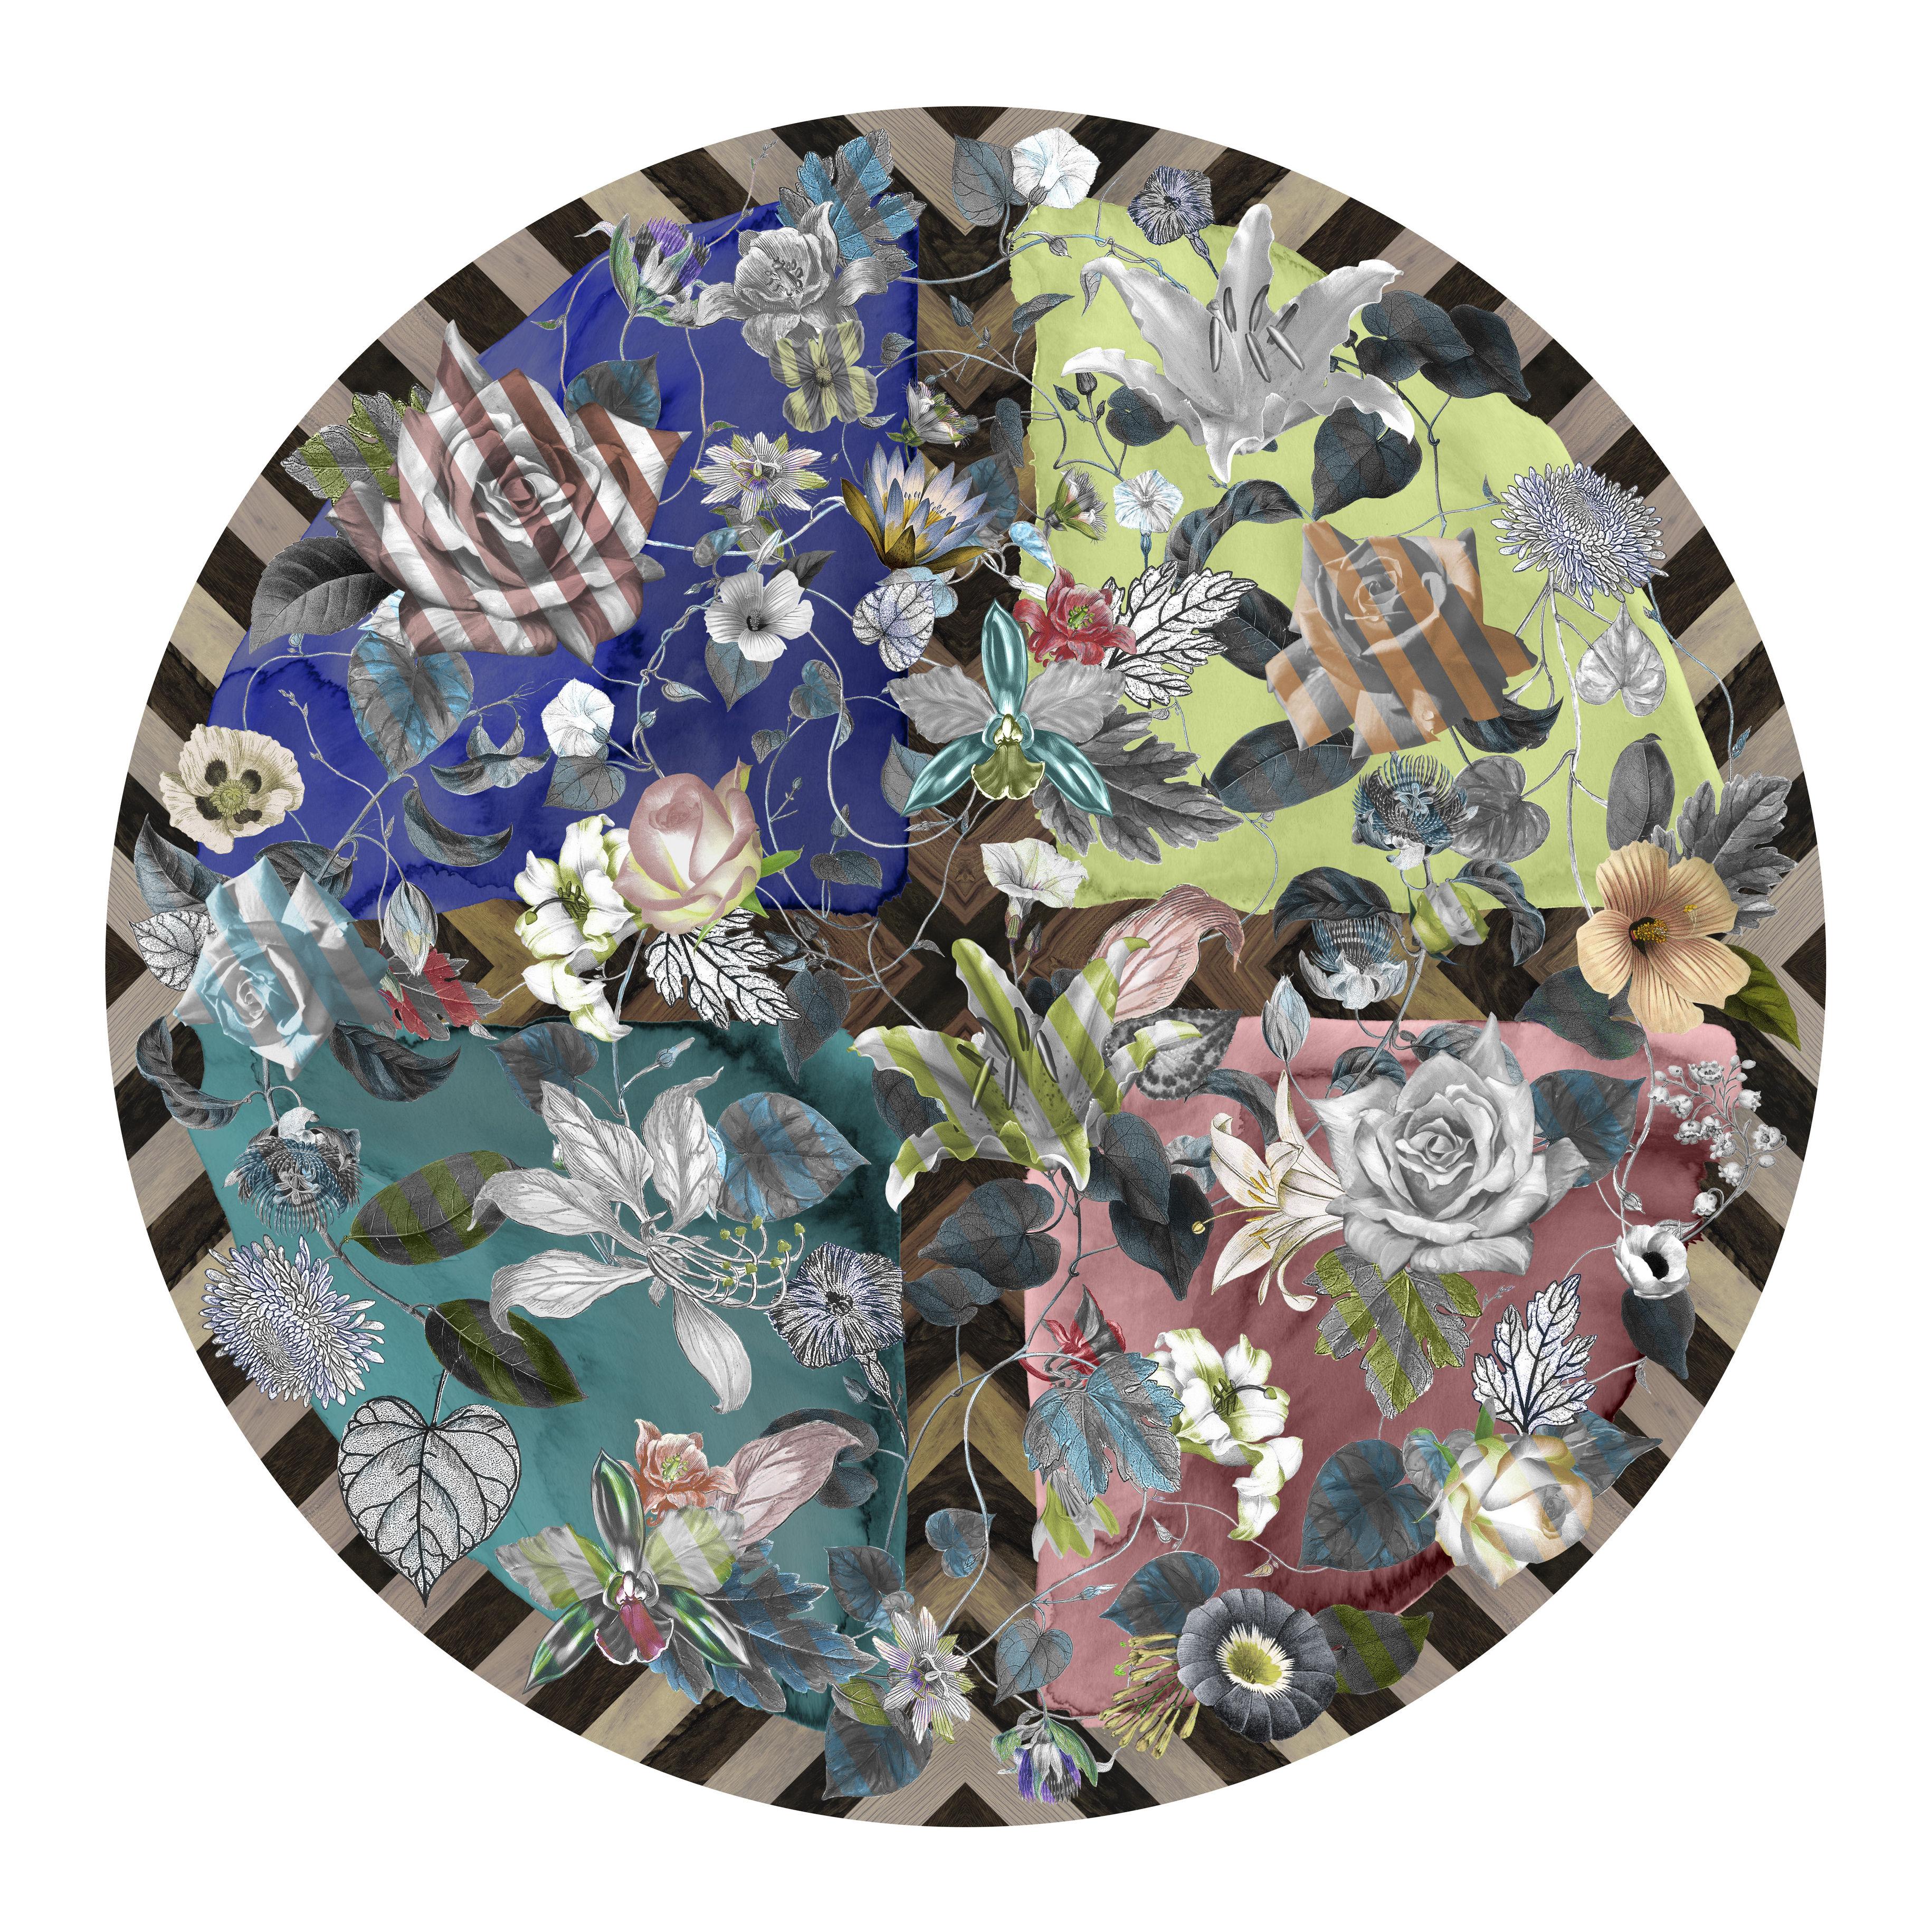 Mobilier - Tapis - Tapis Malmaison Guimauve / Ø 250 cm - Moooi Carpets - Multicolore - Polyamide